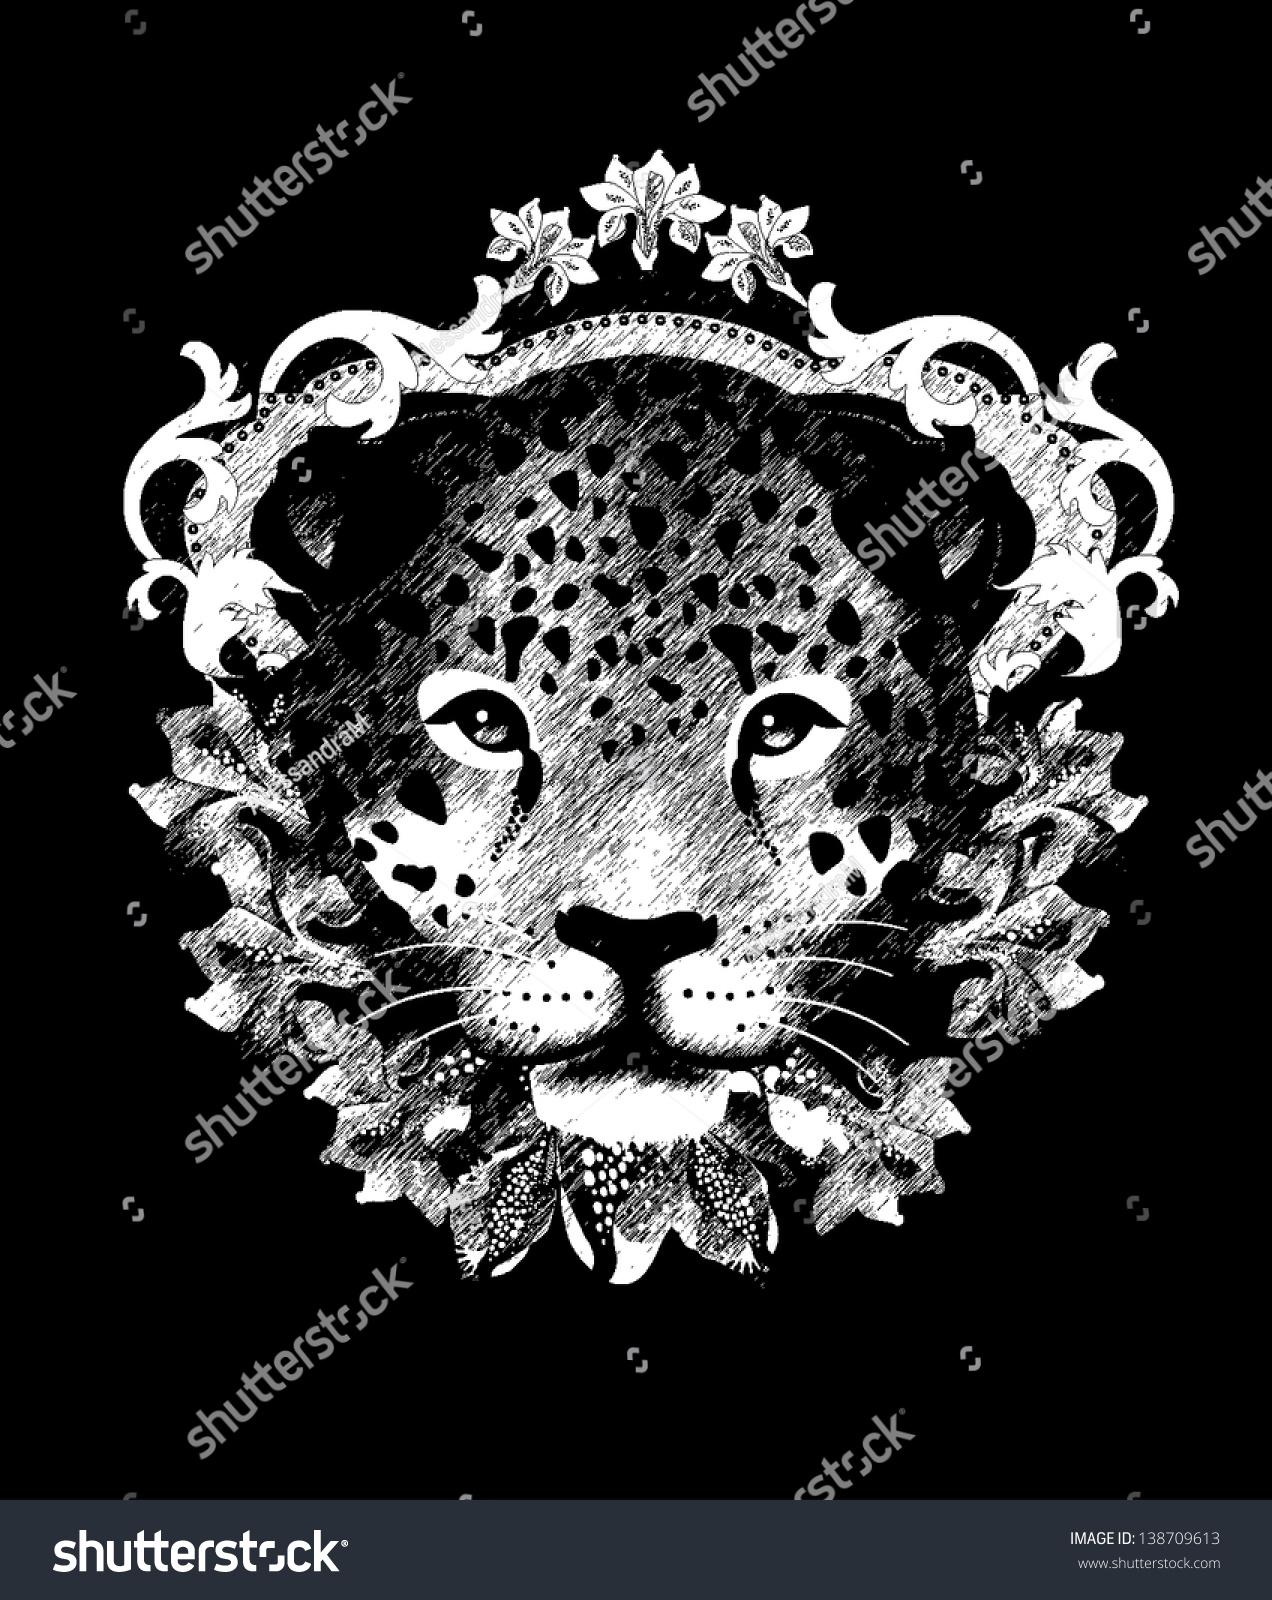 Shirt design elements - Leopard T Shirt Design All Elements Are Editable